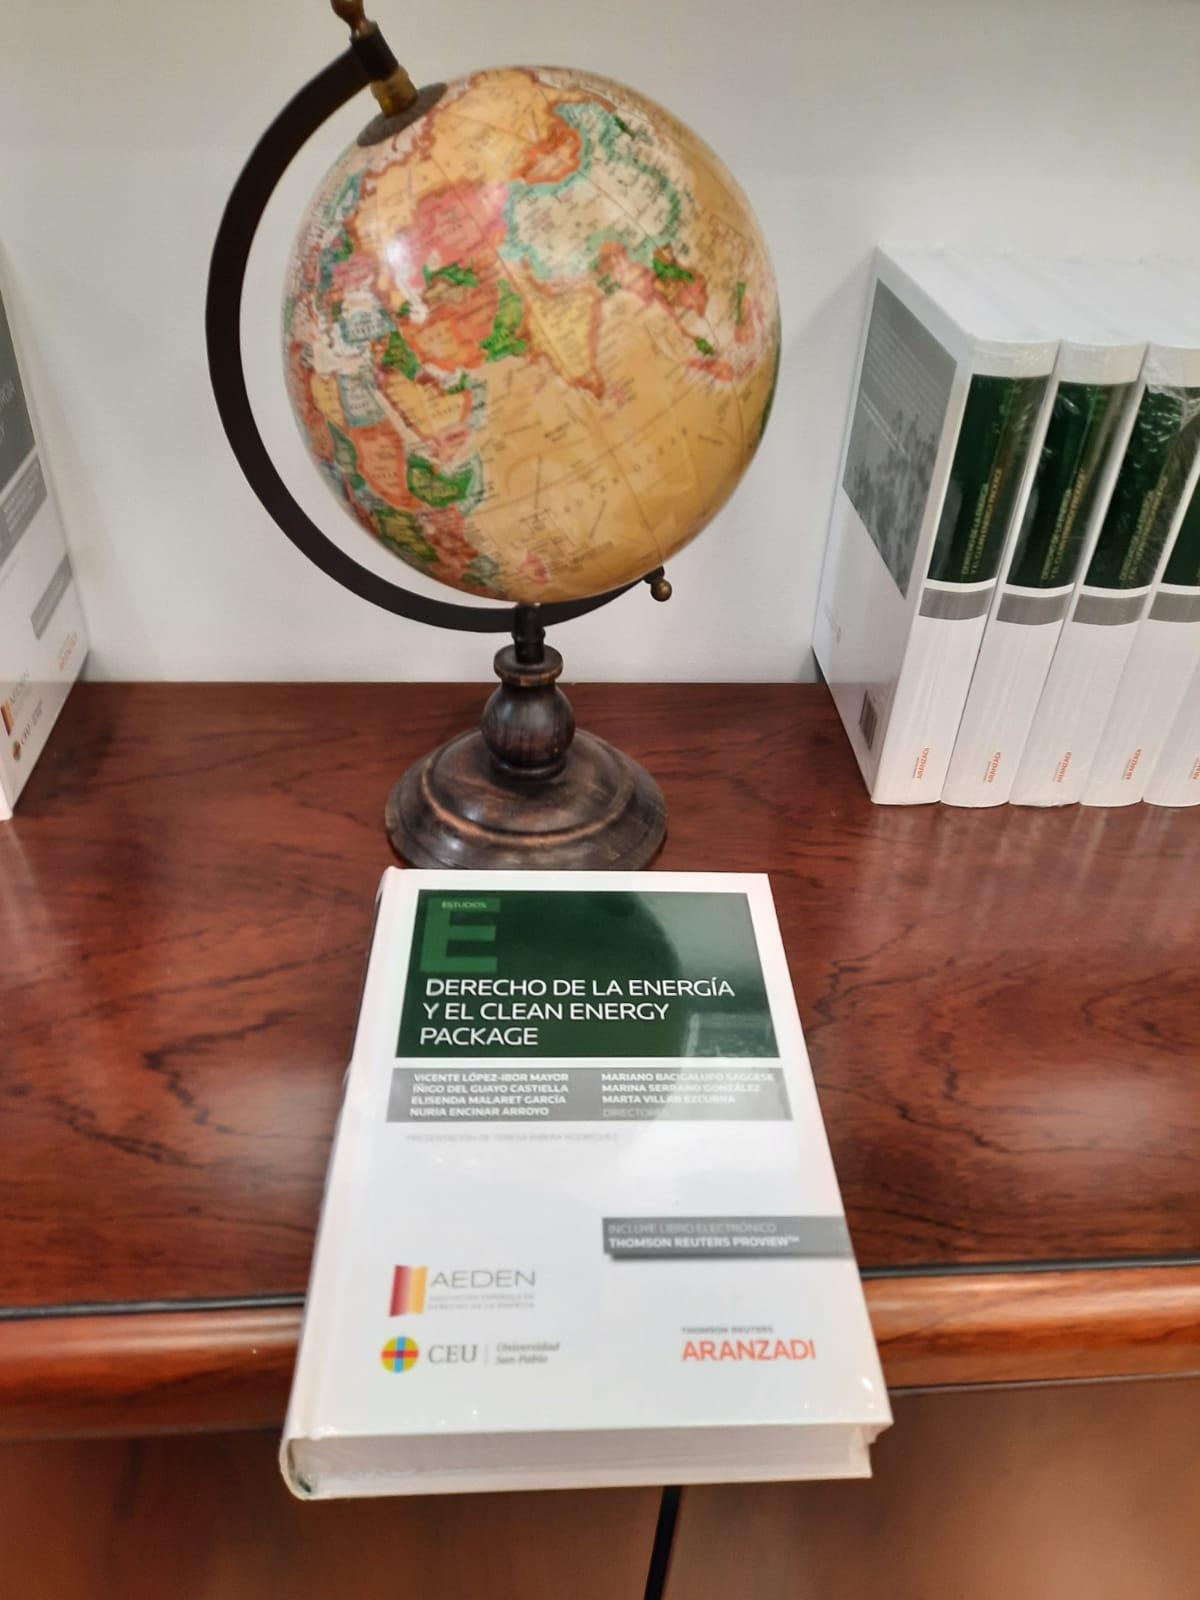 Año 2018. Autor: Vicente López-Ibor Mayor Prólogo: Teresa Ribera Rodríguez